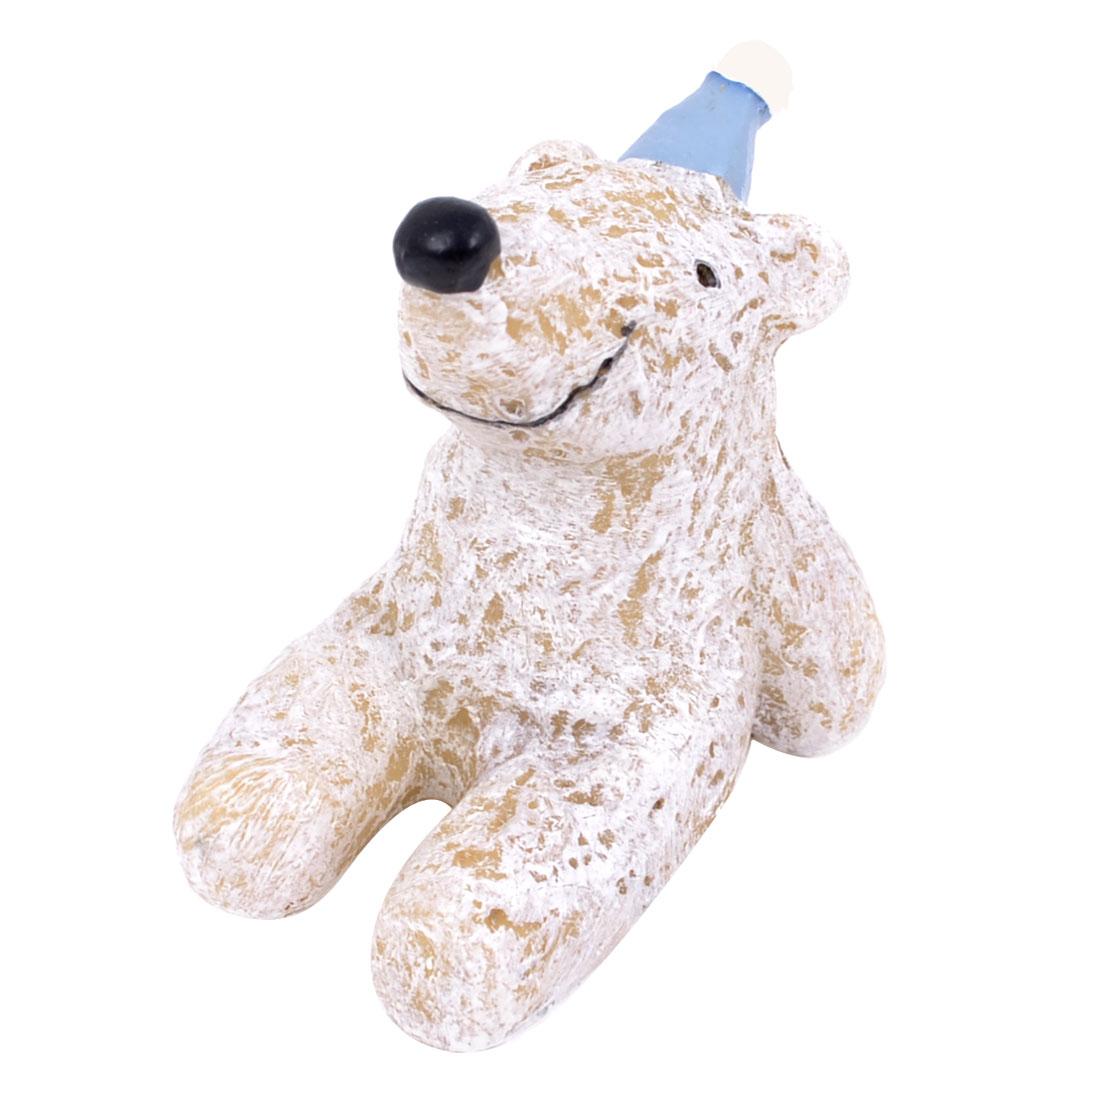 Christmas Tabletop Adorn White Resin Handmade Craft Polar Bear Ornament